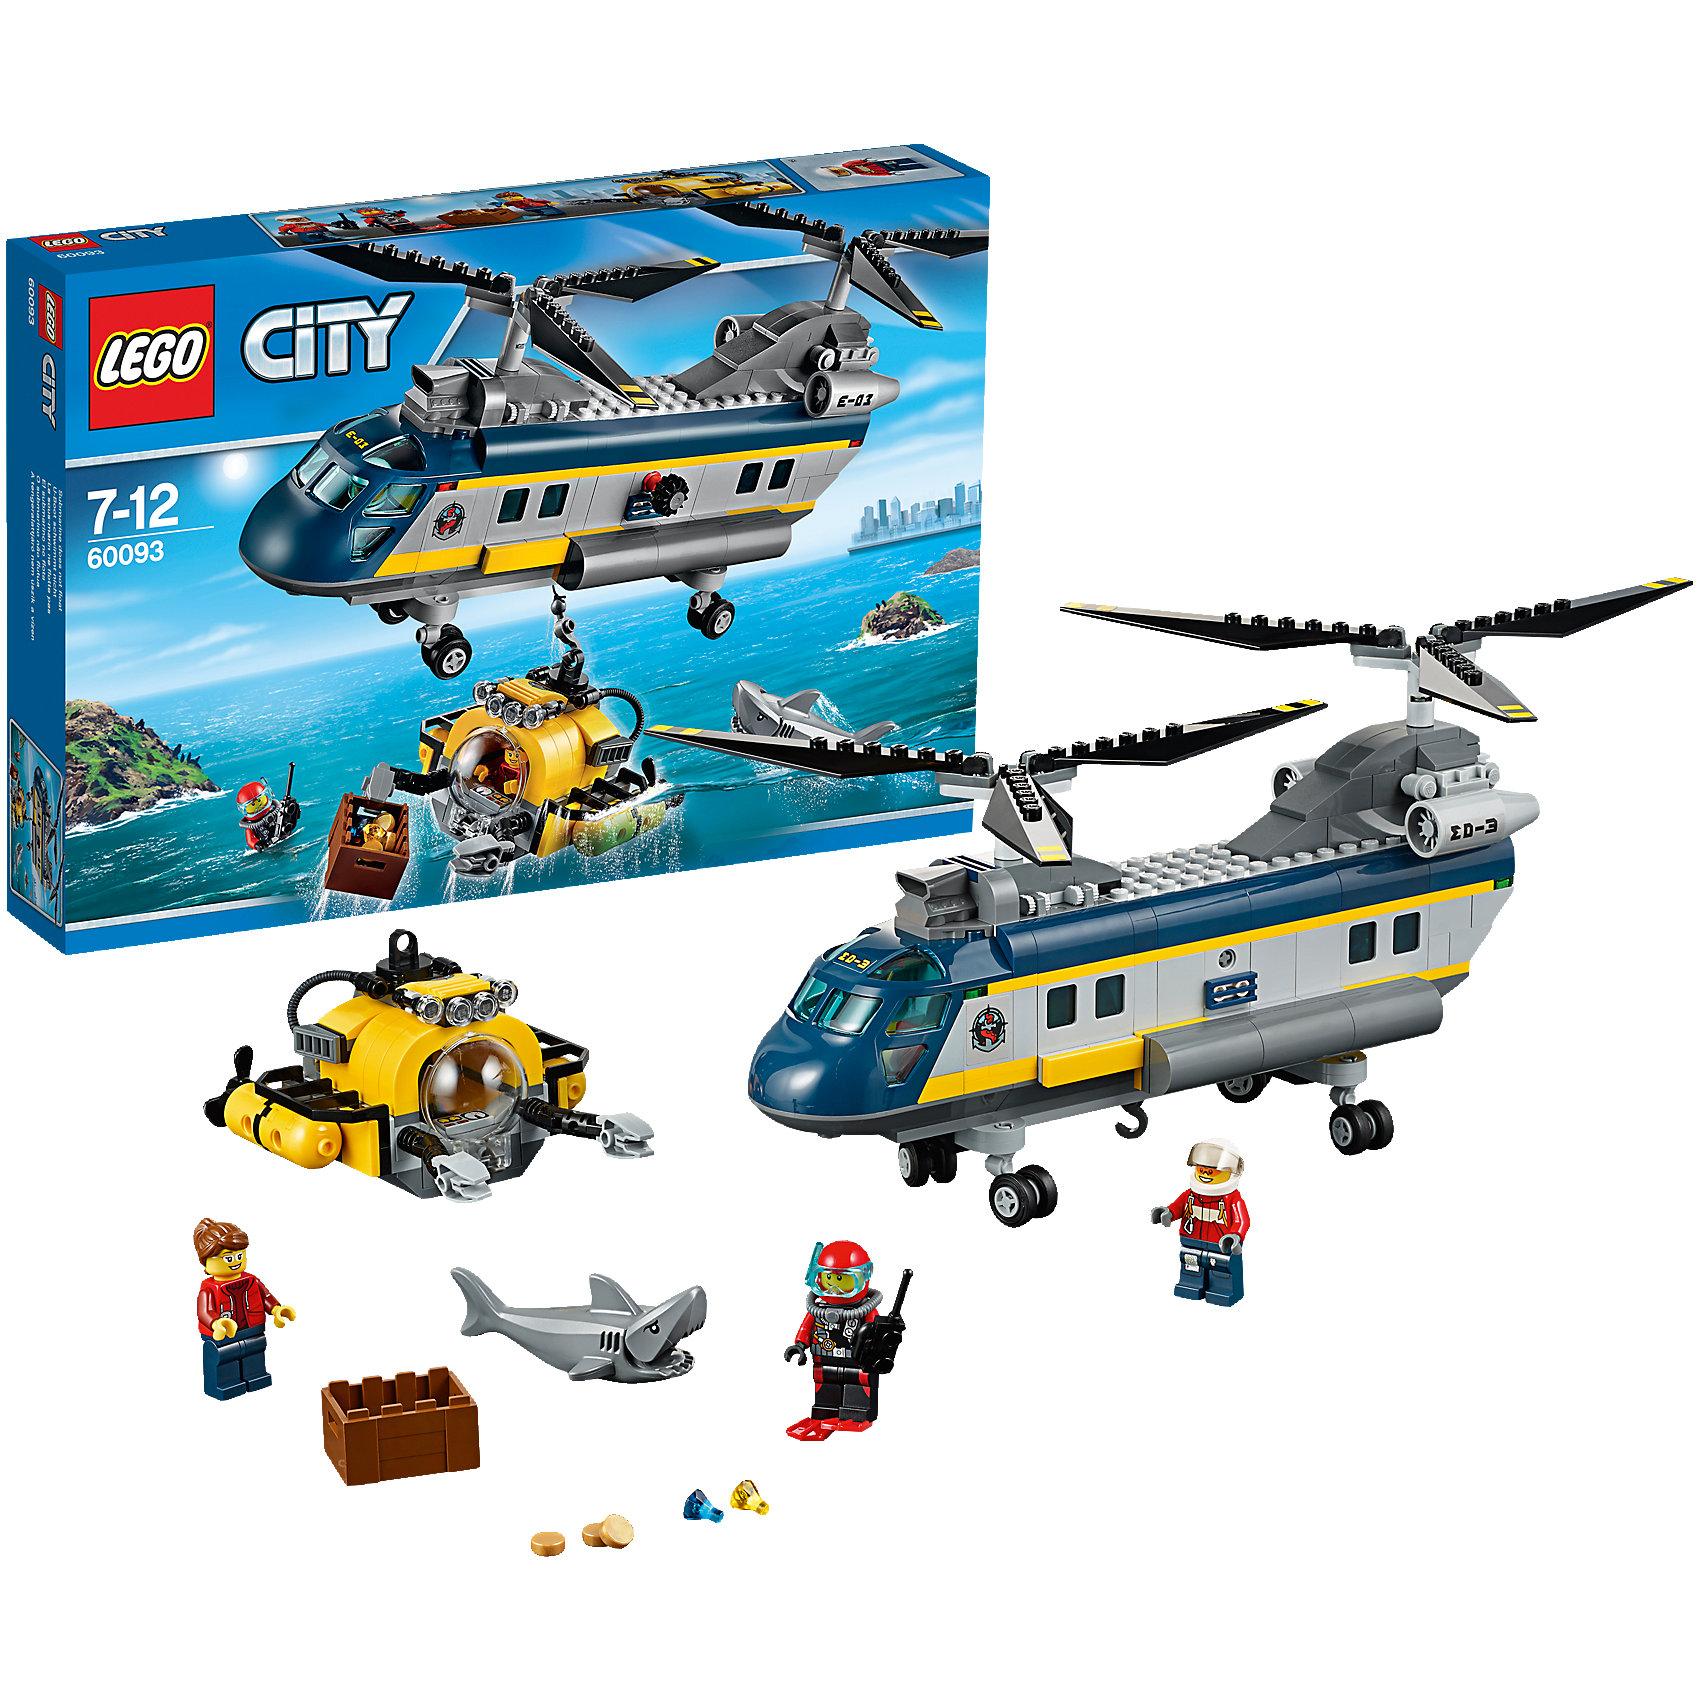 LEGO LEGO City 60093: Вертолет исследователей моря lego lego city 60093 вертолет исследователей моря